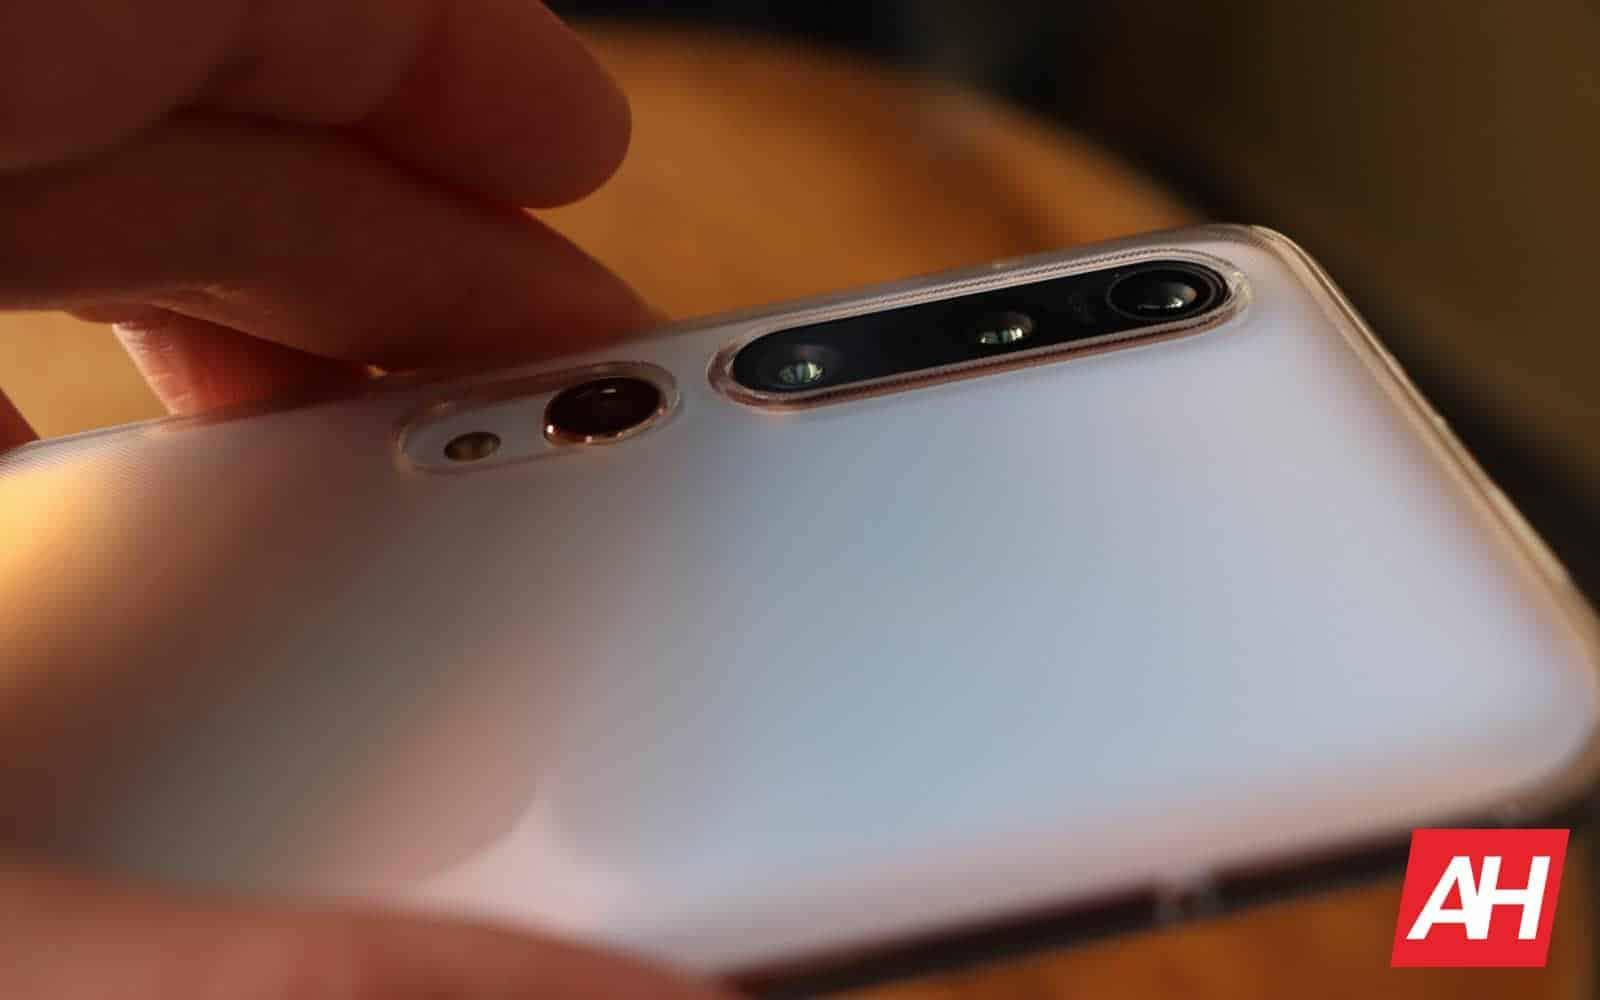 02 2 Hardware Xiaomi Mi 10 Pro 5G Review